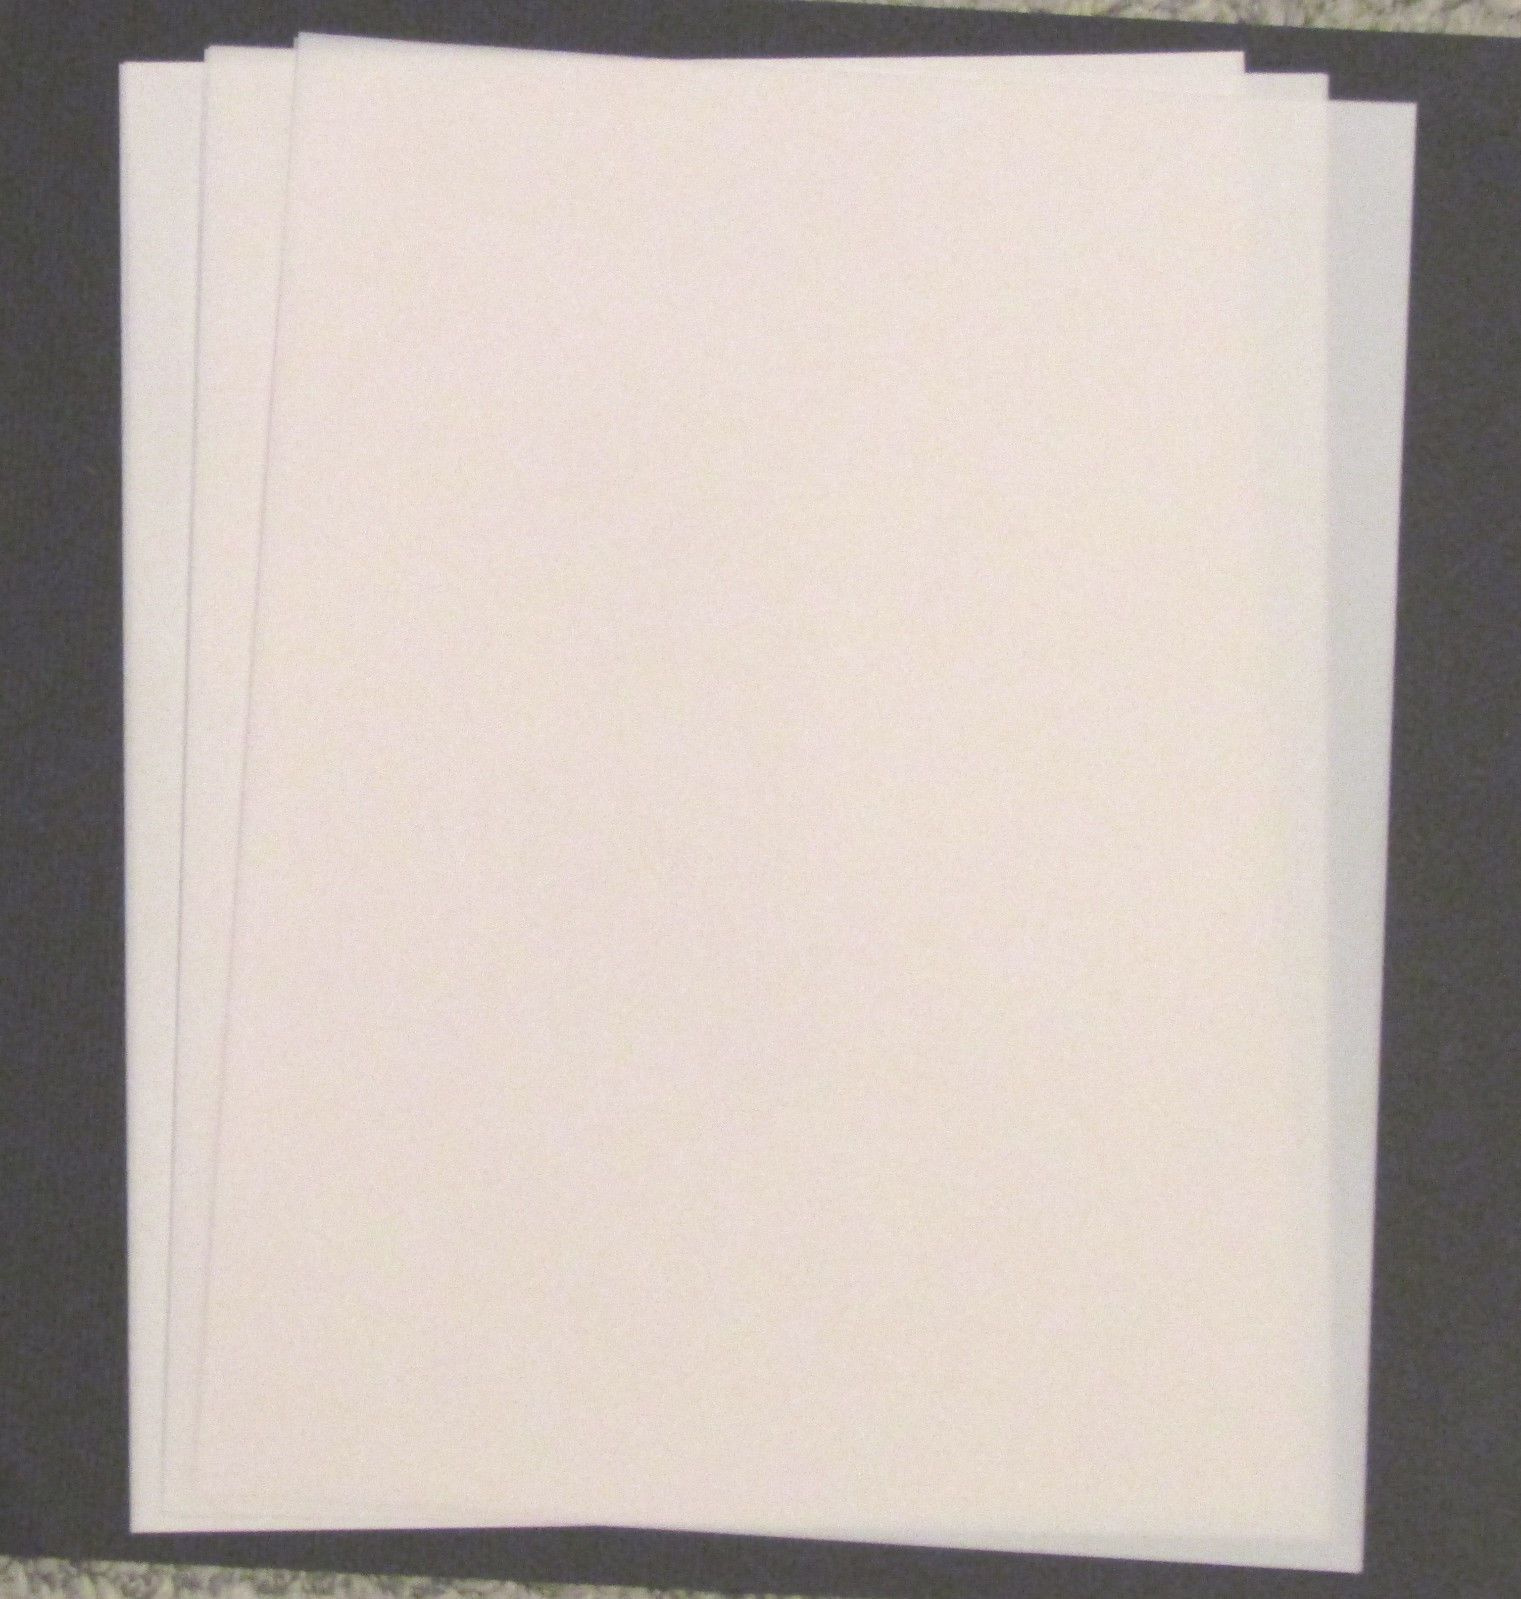 Details About 17 Lb Uv Ultra Translucent Vellum Paper Radiant